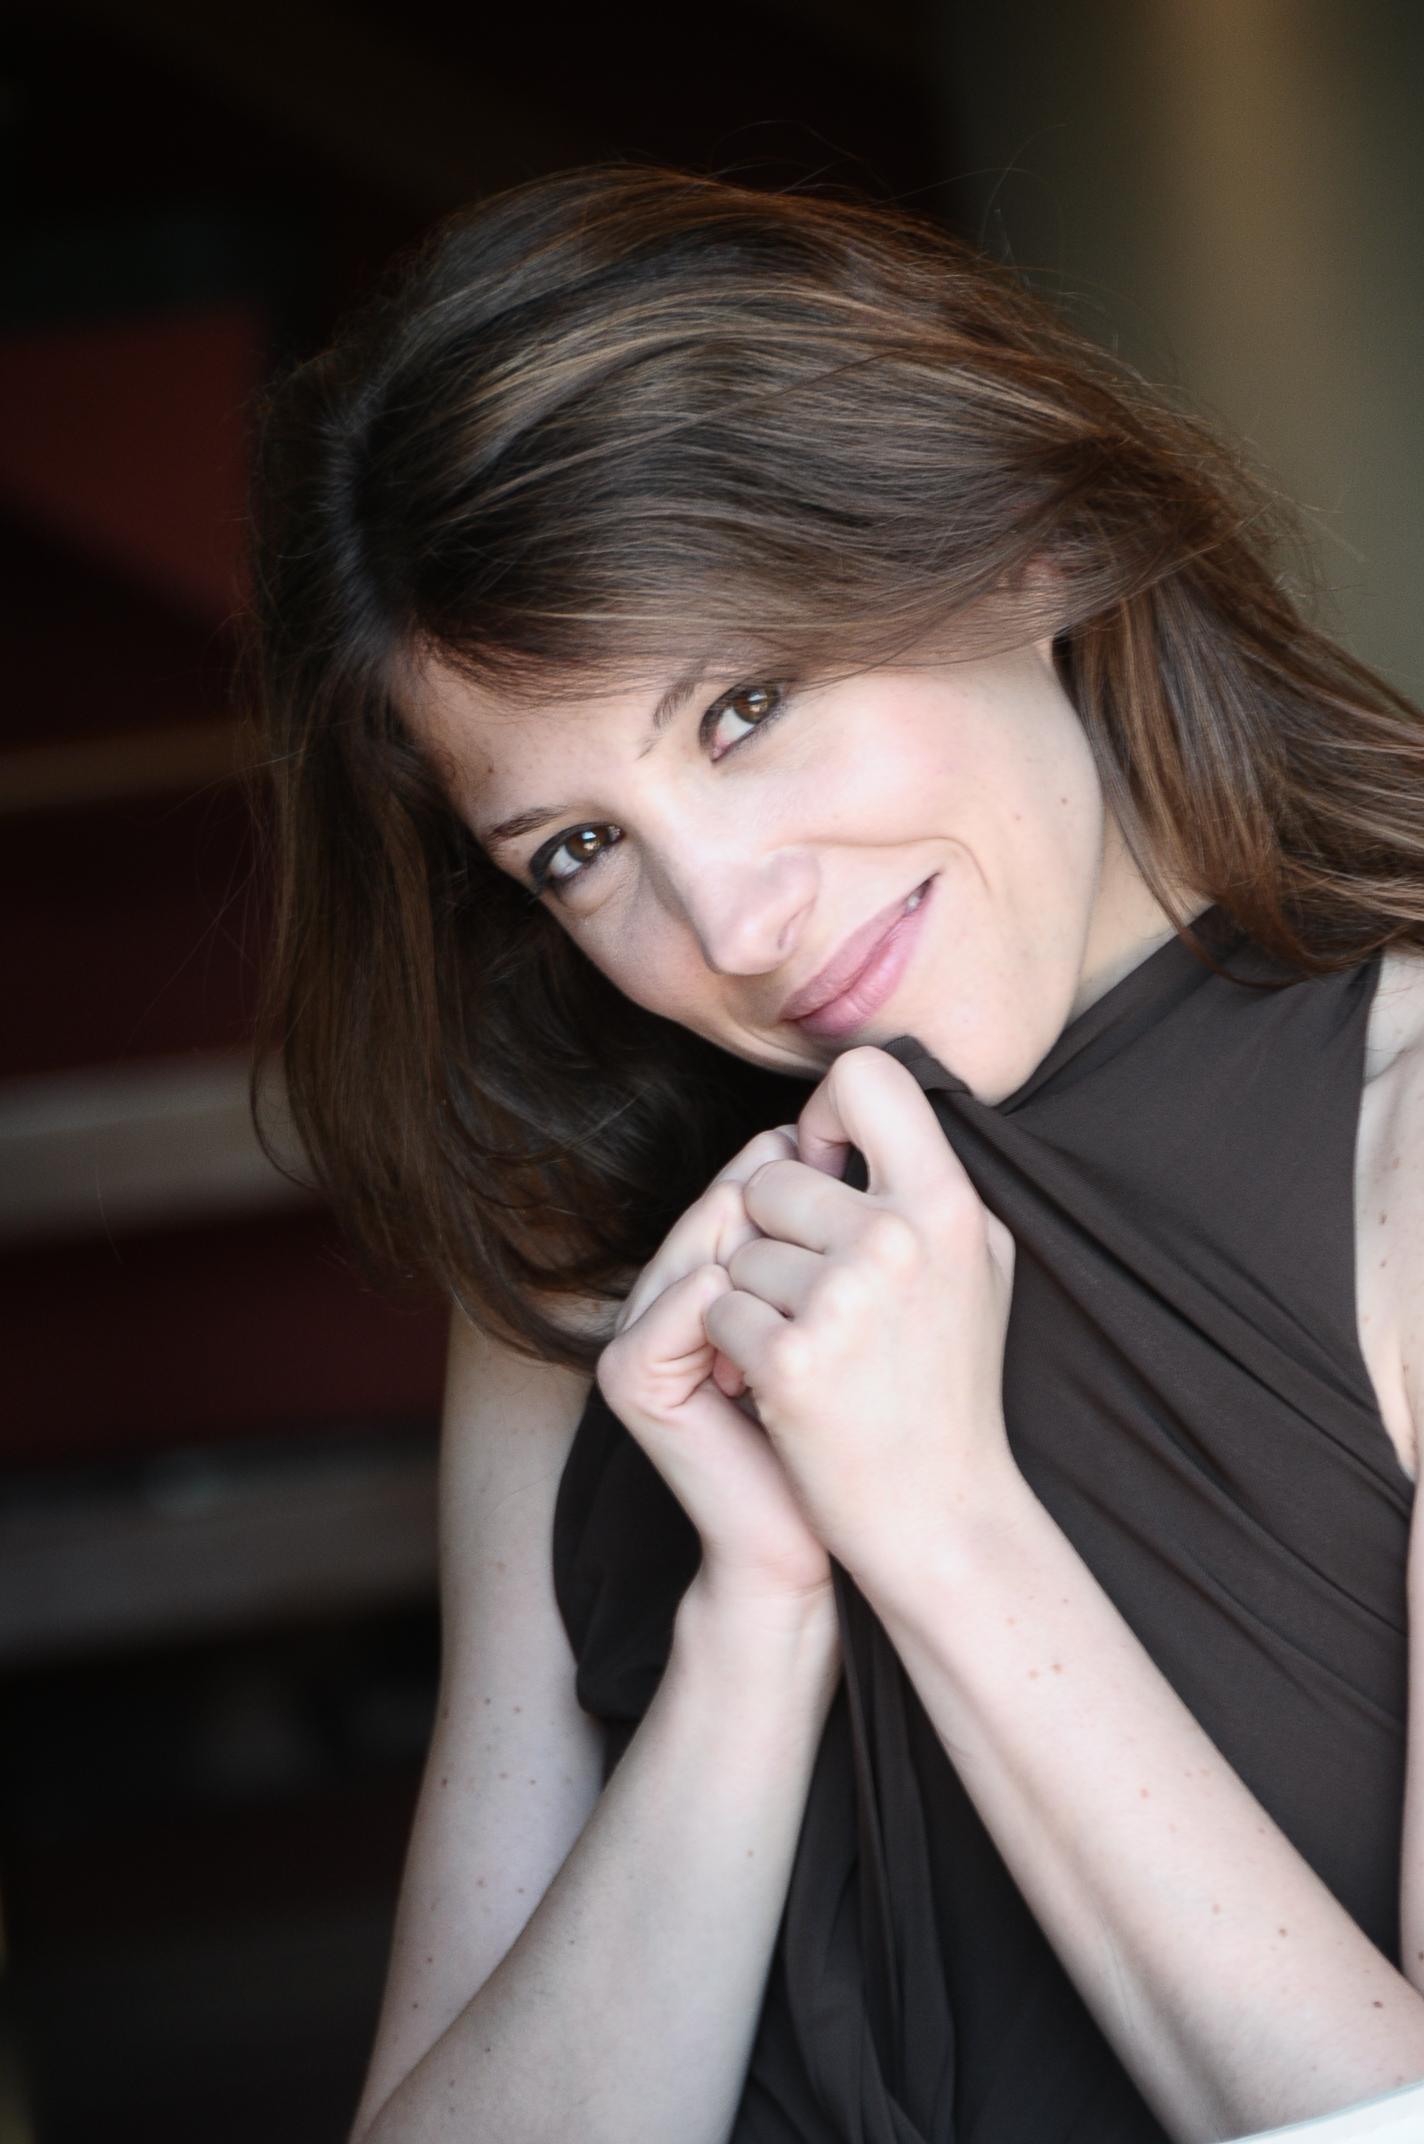 Cristina Puccinelli Actress Photo book by Federico Ferrantini